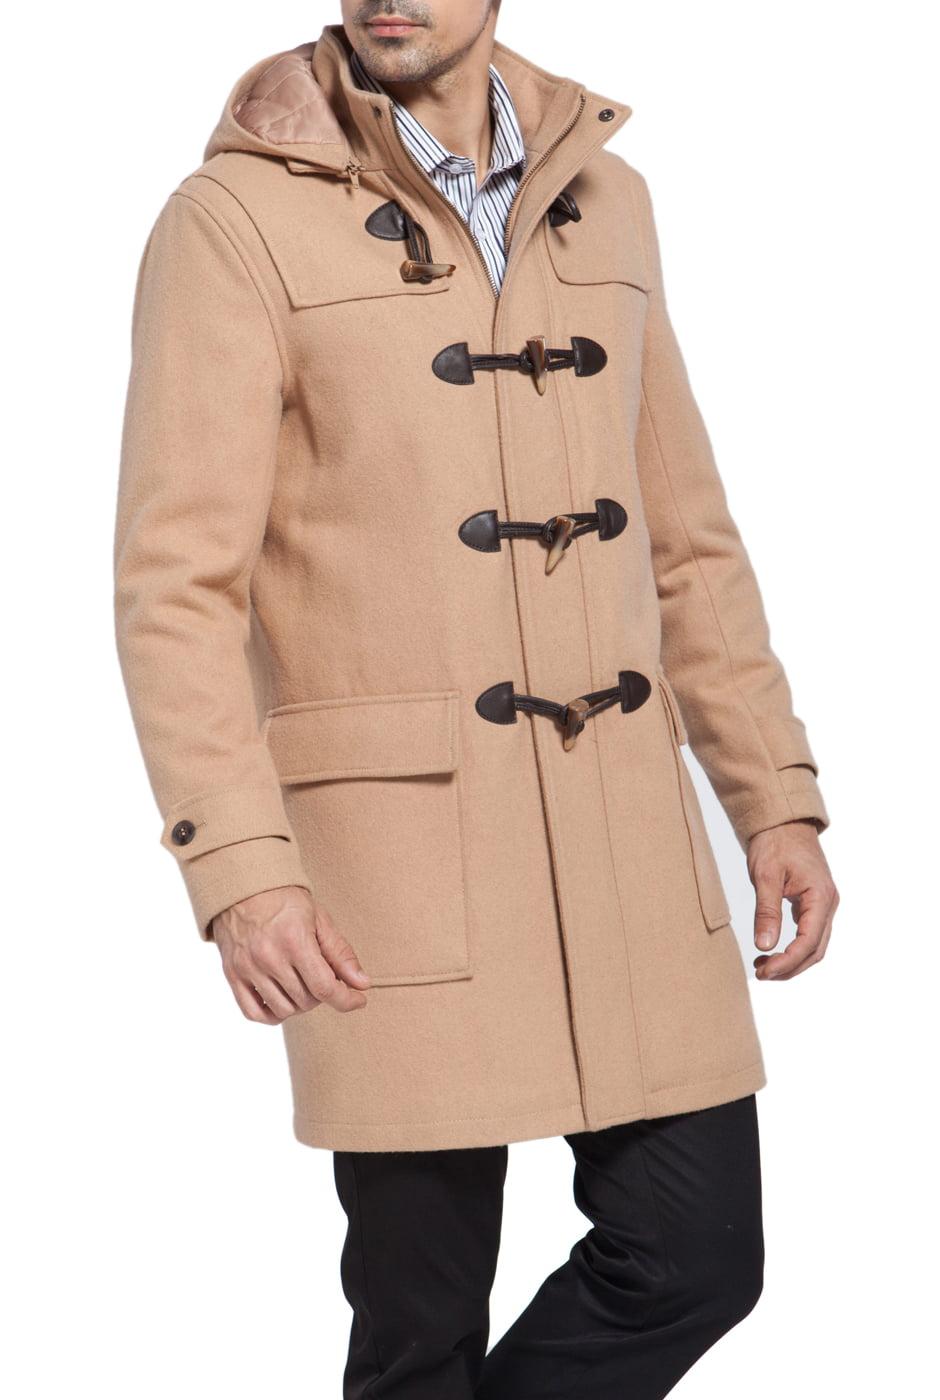 BGSD Men's 'Benjamin' Wool Blend Classic Duffle Coat - Walmart.com